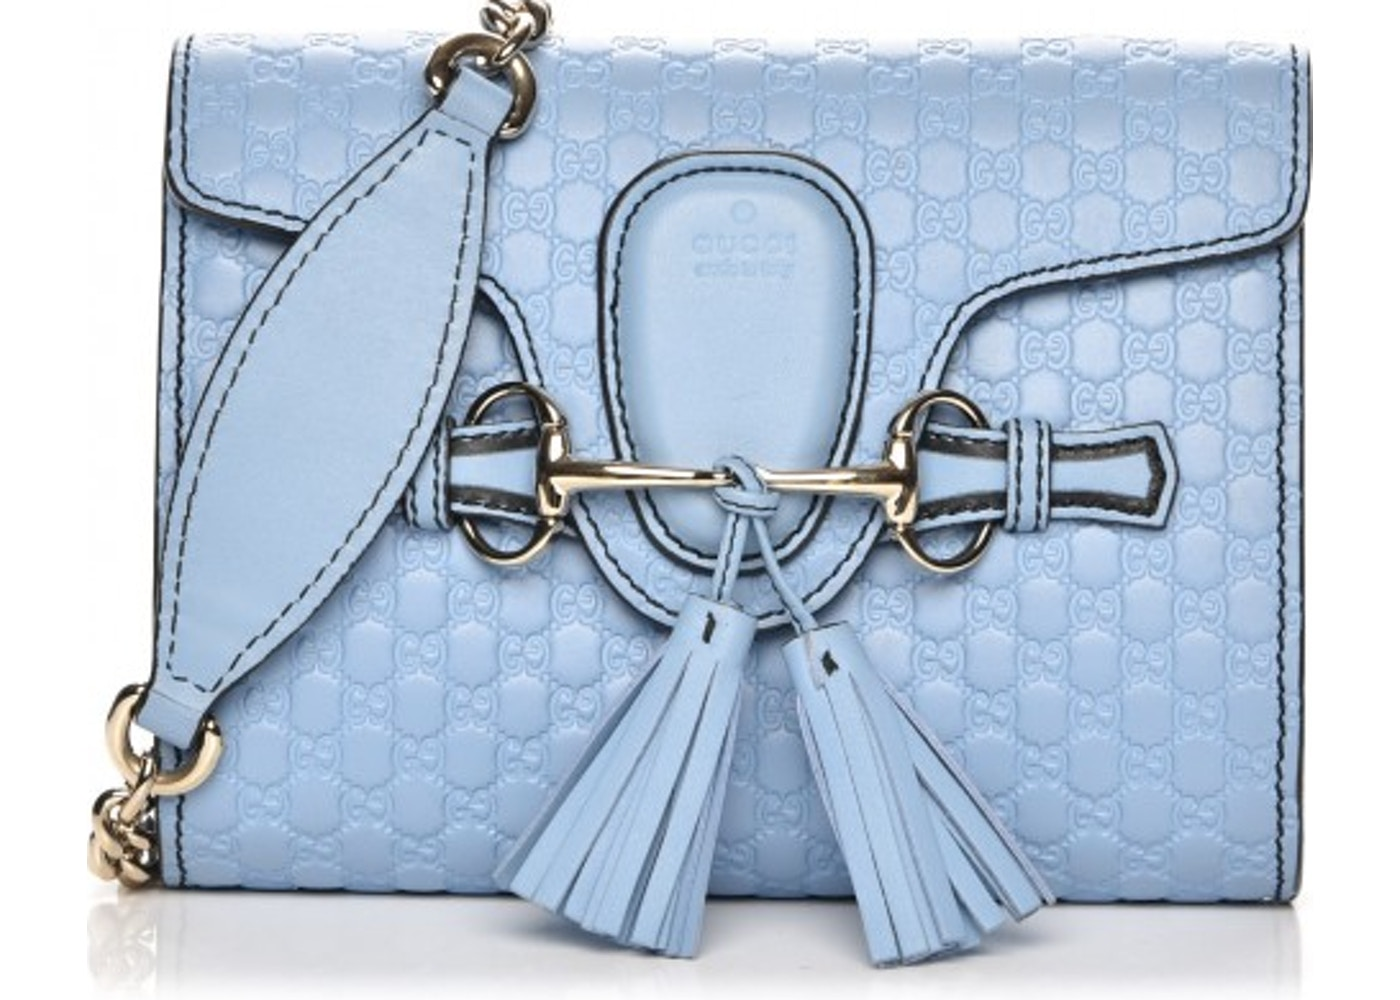 90835a8bf781 Gucci Emily Flap Shoulder Bag Monogram Microguccissima Mini Light Blue.  Monogram Microguccissima Mini Light Blue